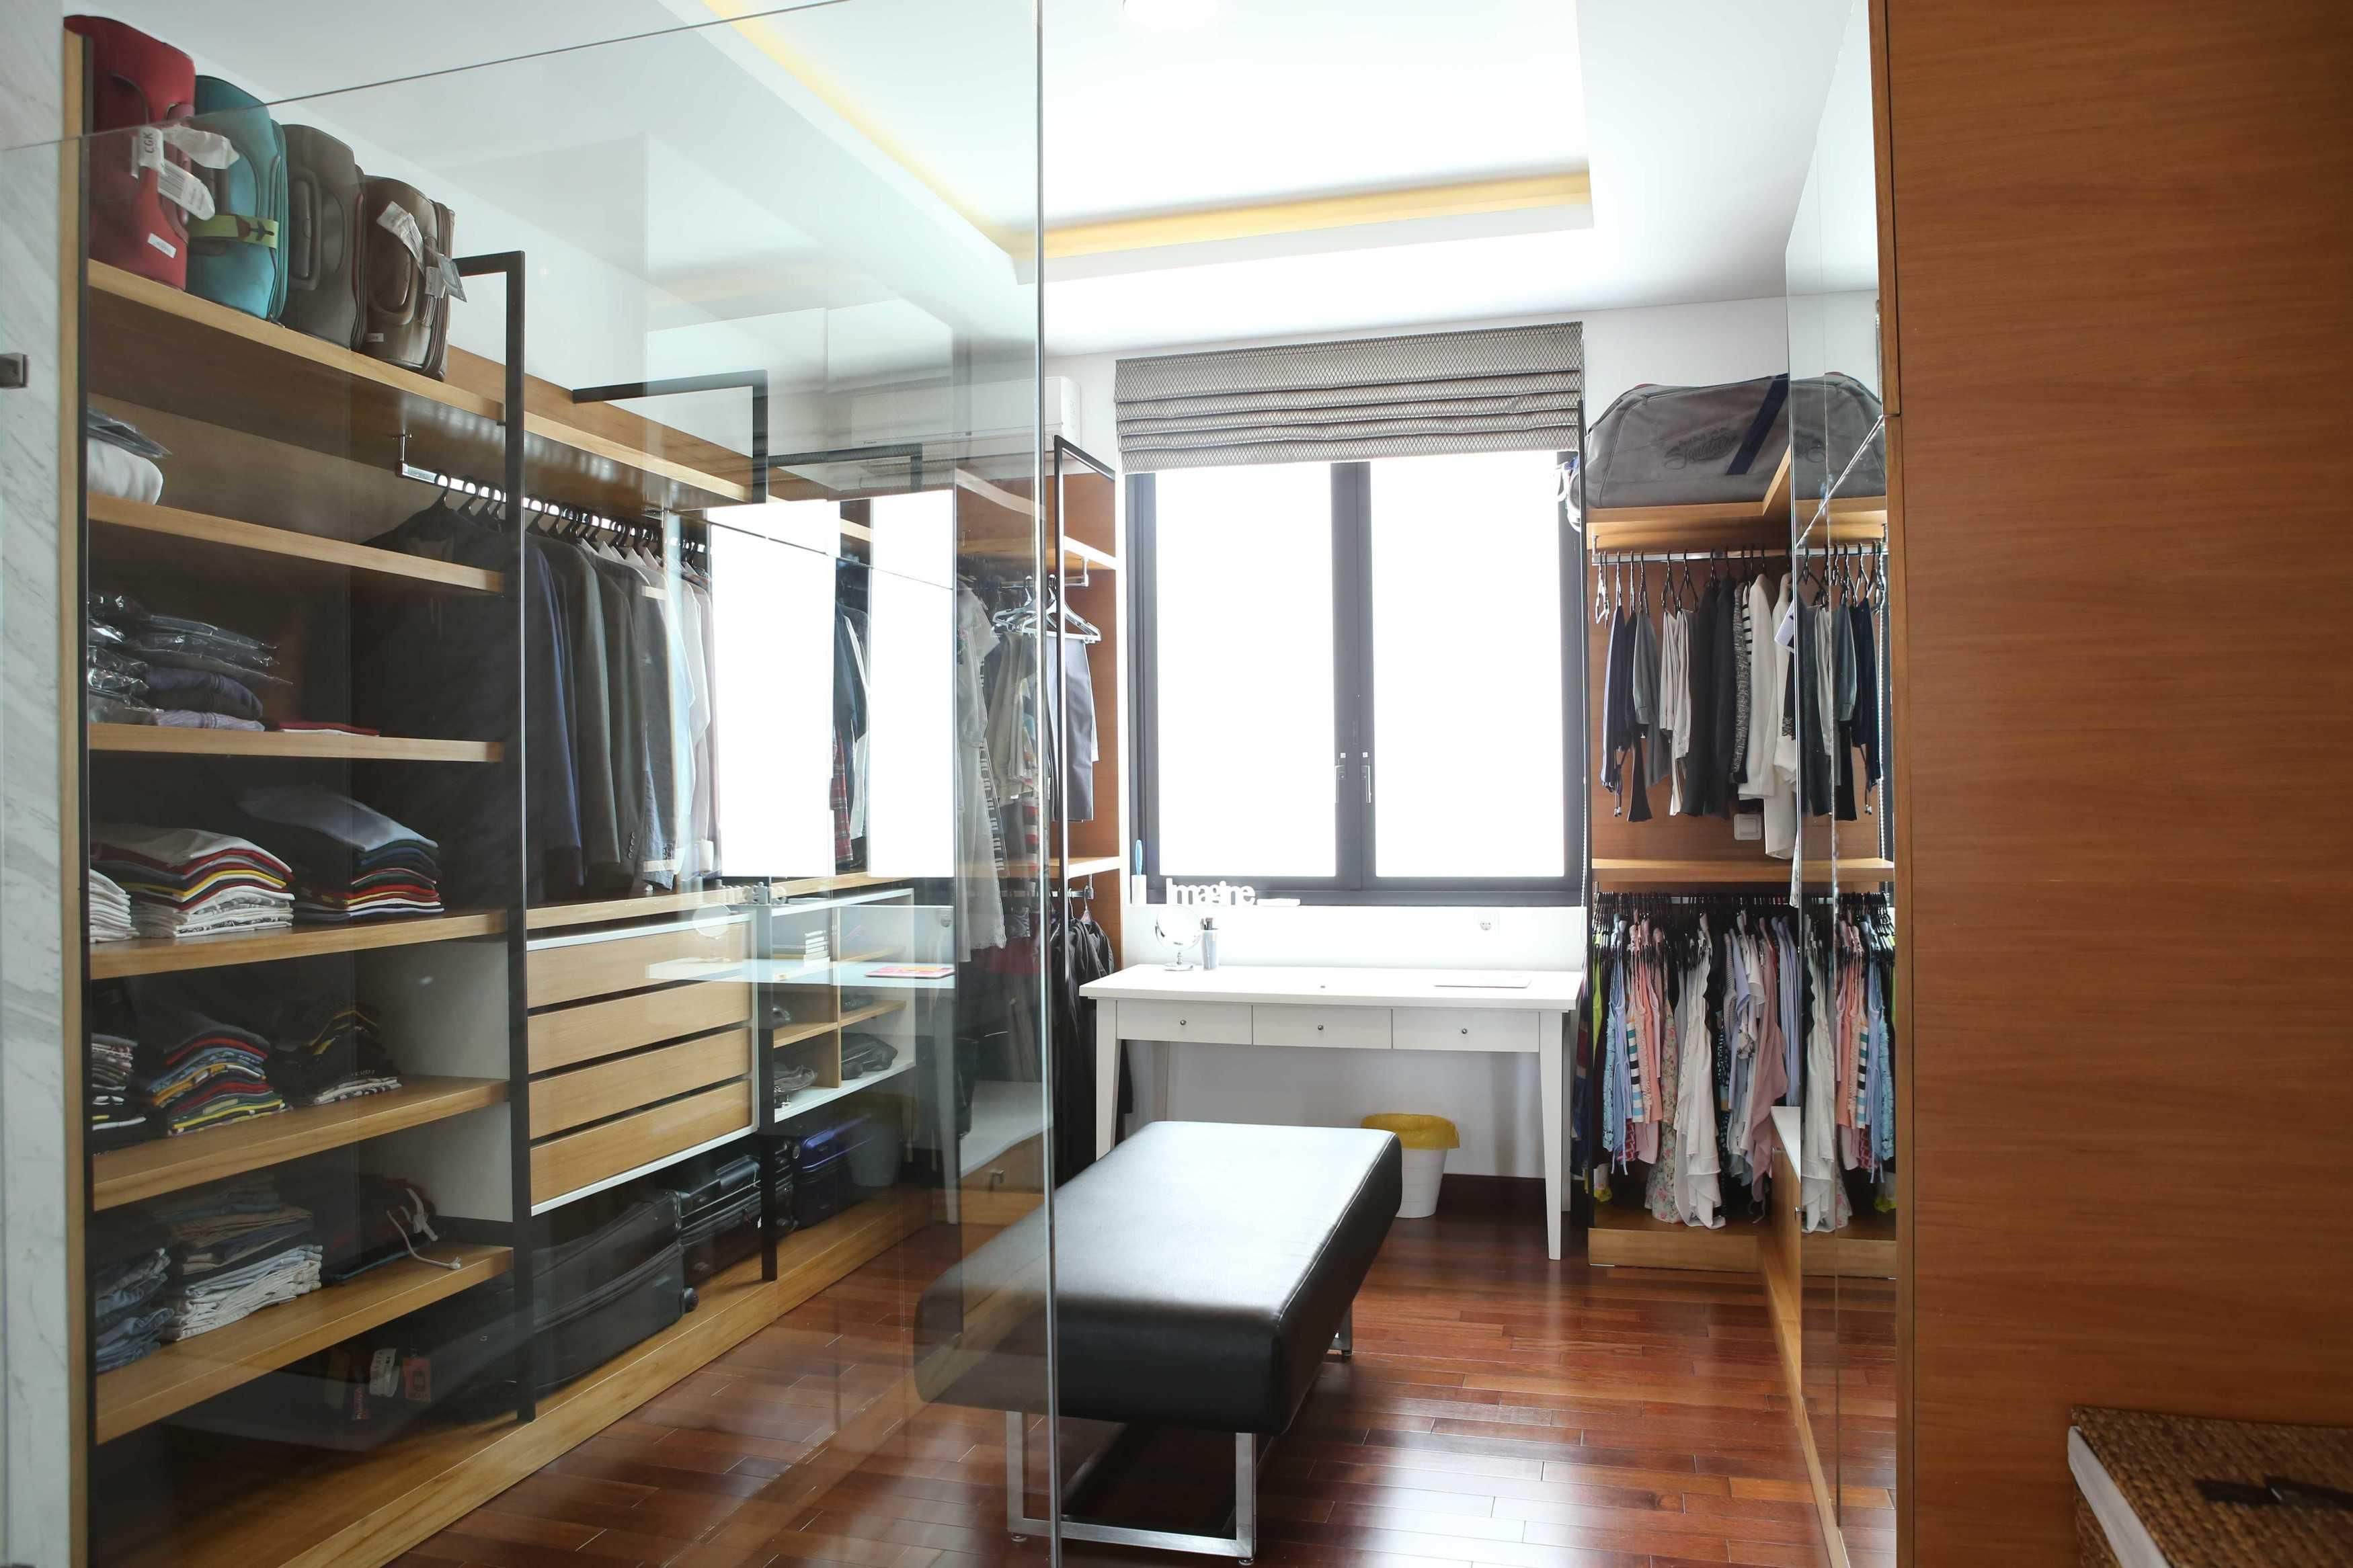 Home By Fabelio.com Dempo House Jakarta Selatan, Kota Jakarta Selatan, Daerah Khusus Ibukota Jakarta, Indonesia  Tanjung Duren's Villa Living Room Contemporary  53289